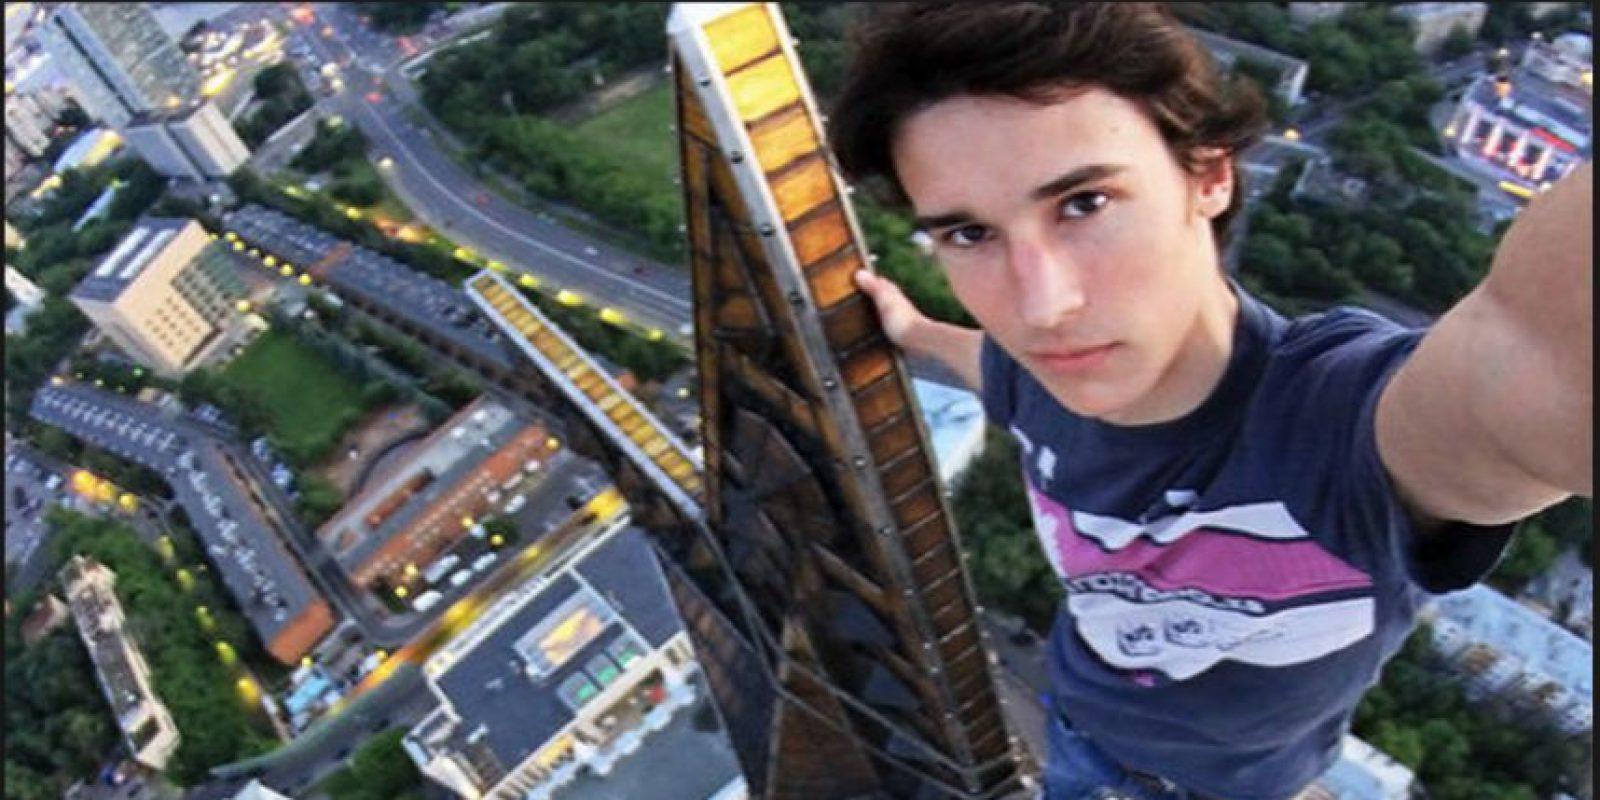 Él es Kirill Oreshkin, otro joven que se toma selfies extremos Foto:Kirill Oreshkin